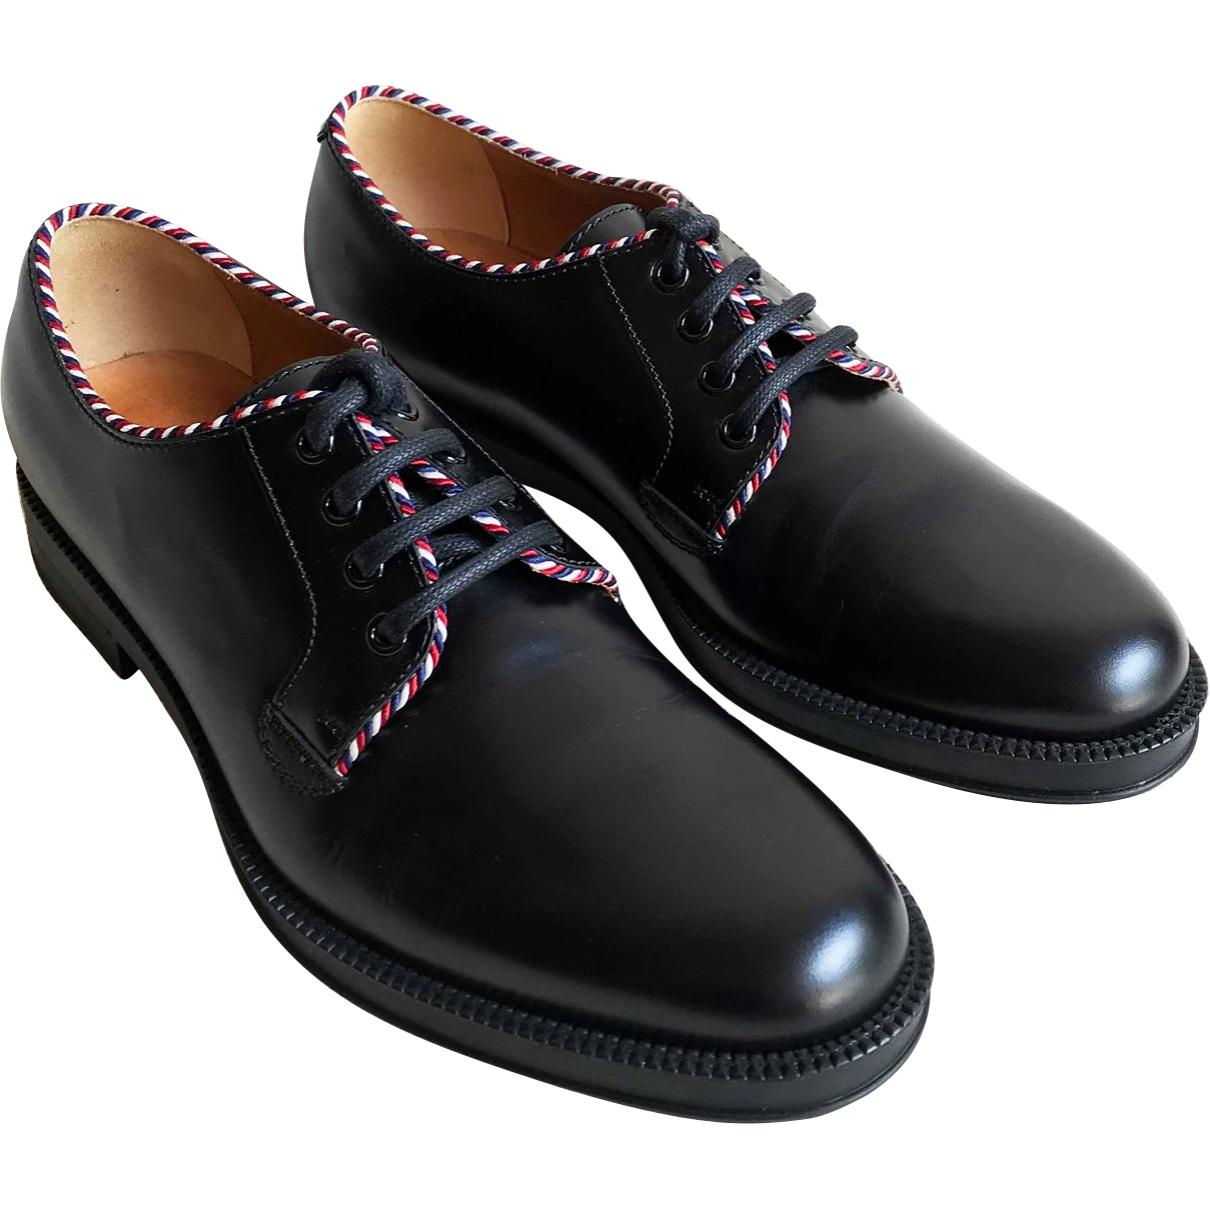 Gucci \N Black Leather Lace ups for Men 42 EU